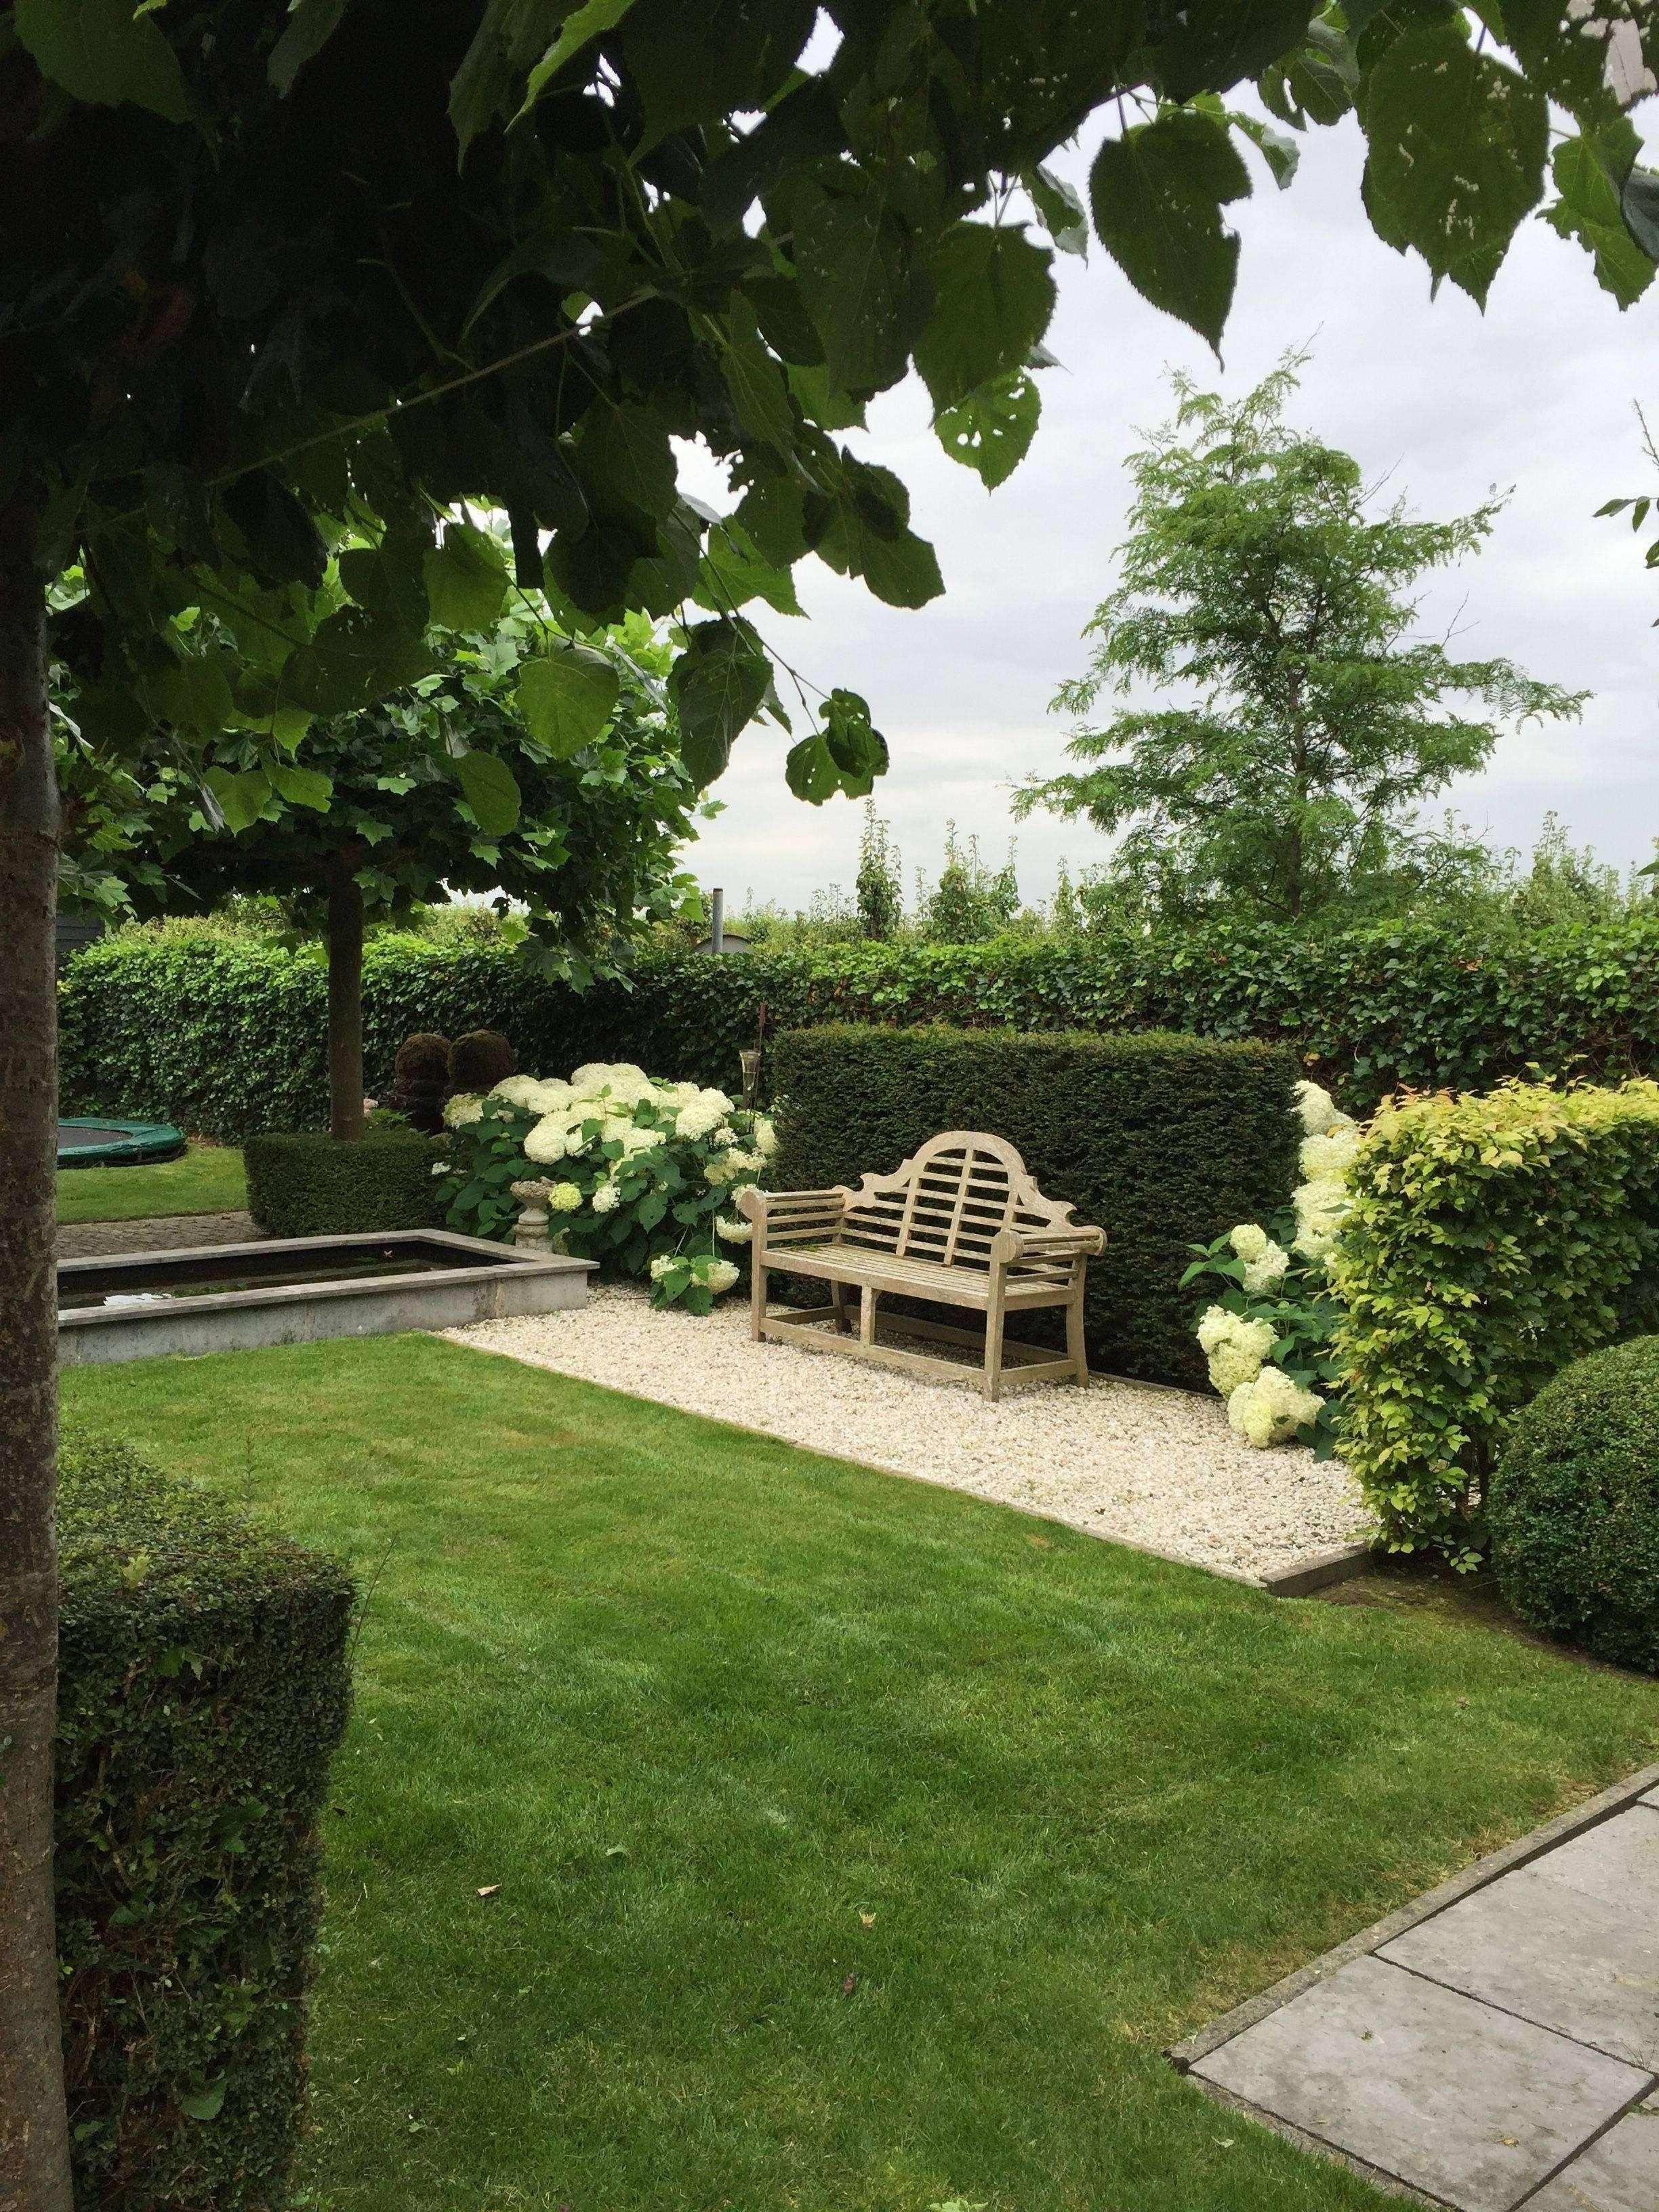 Staggering Backyard Ideas No Grass | Small garden design ... on Small Backyard Ideas No Grass  id=30836